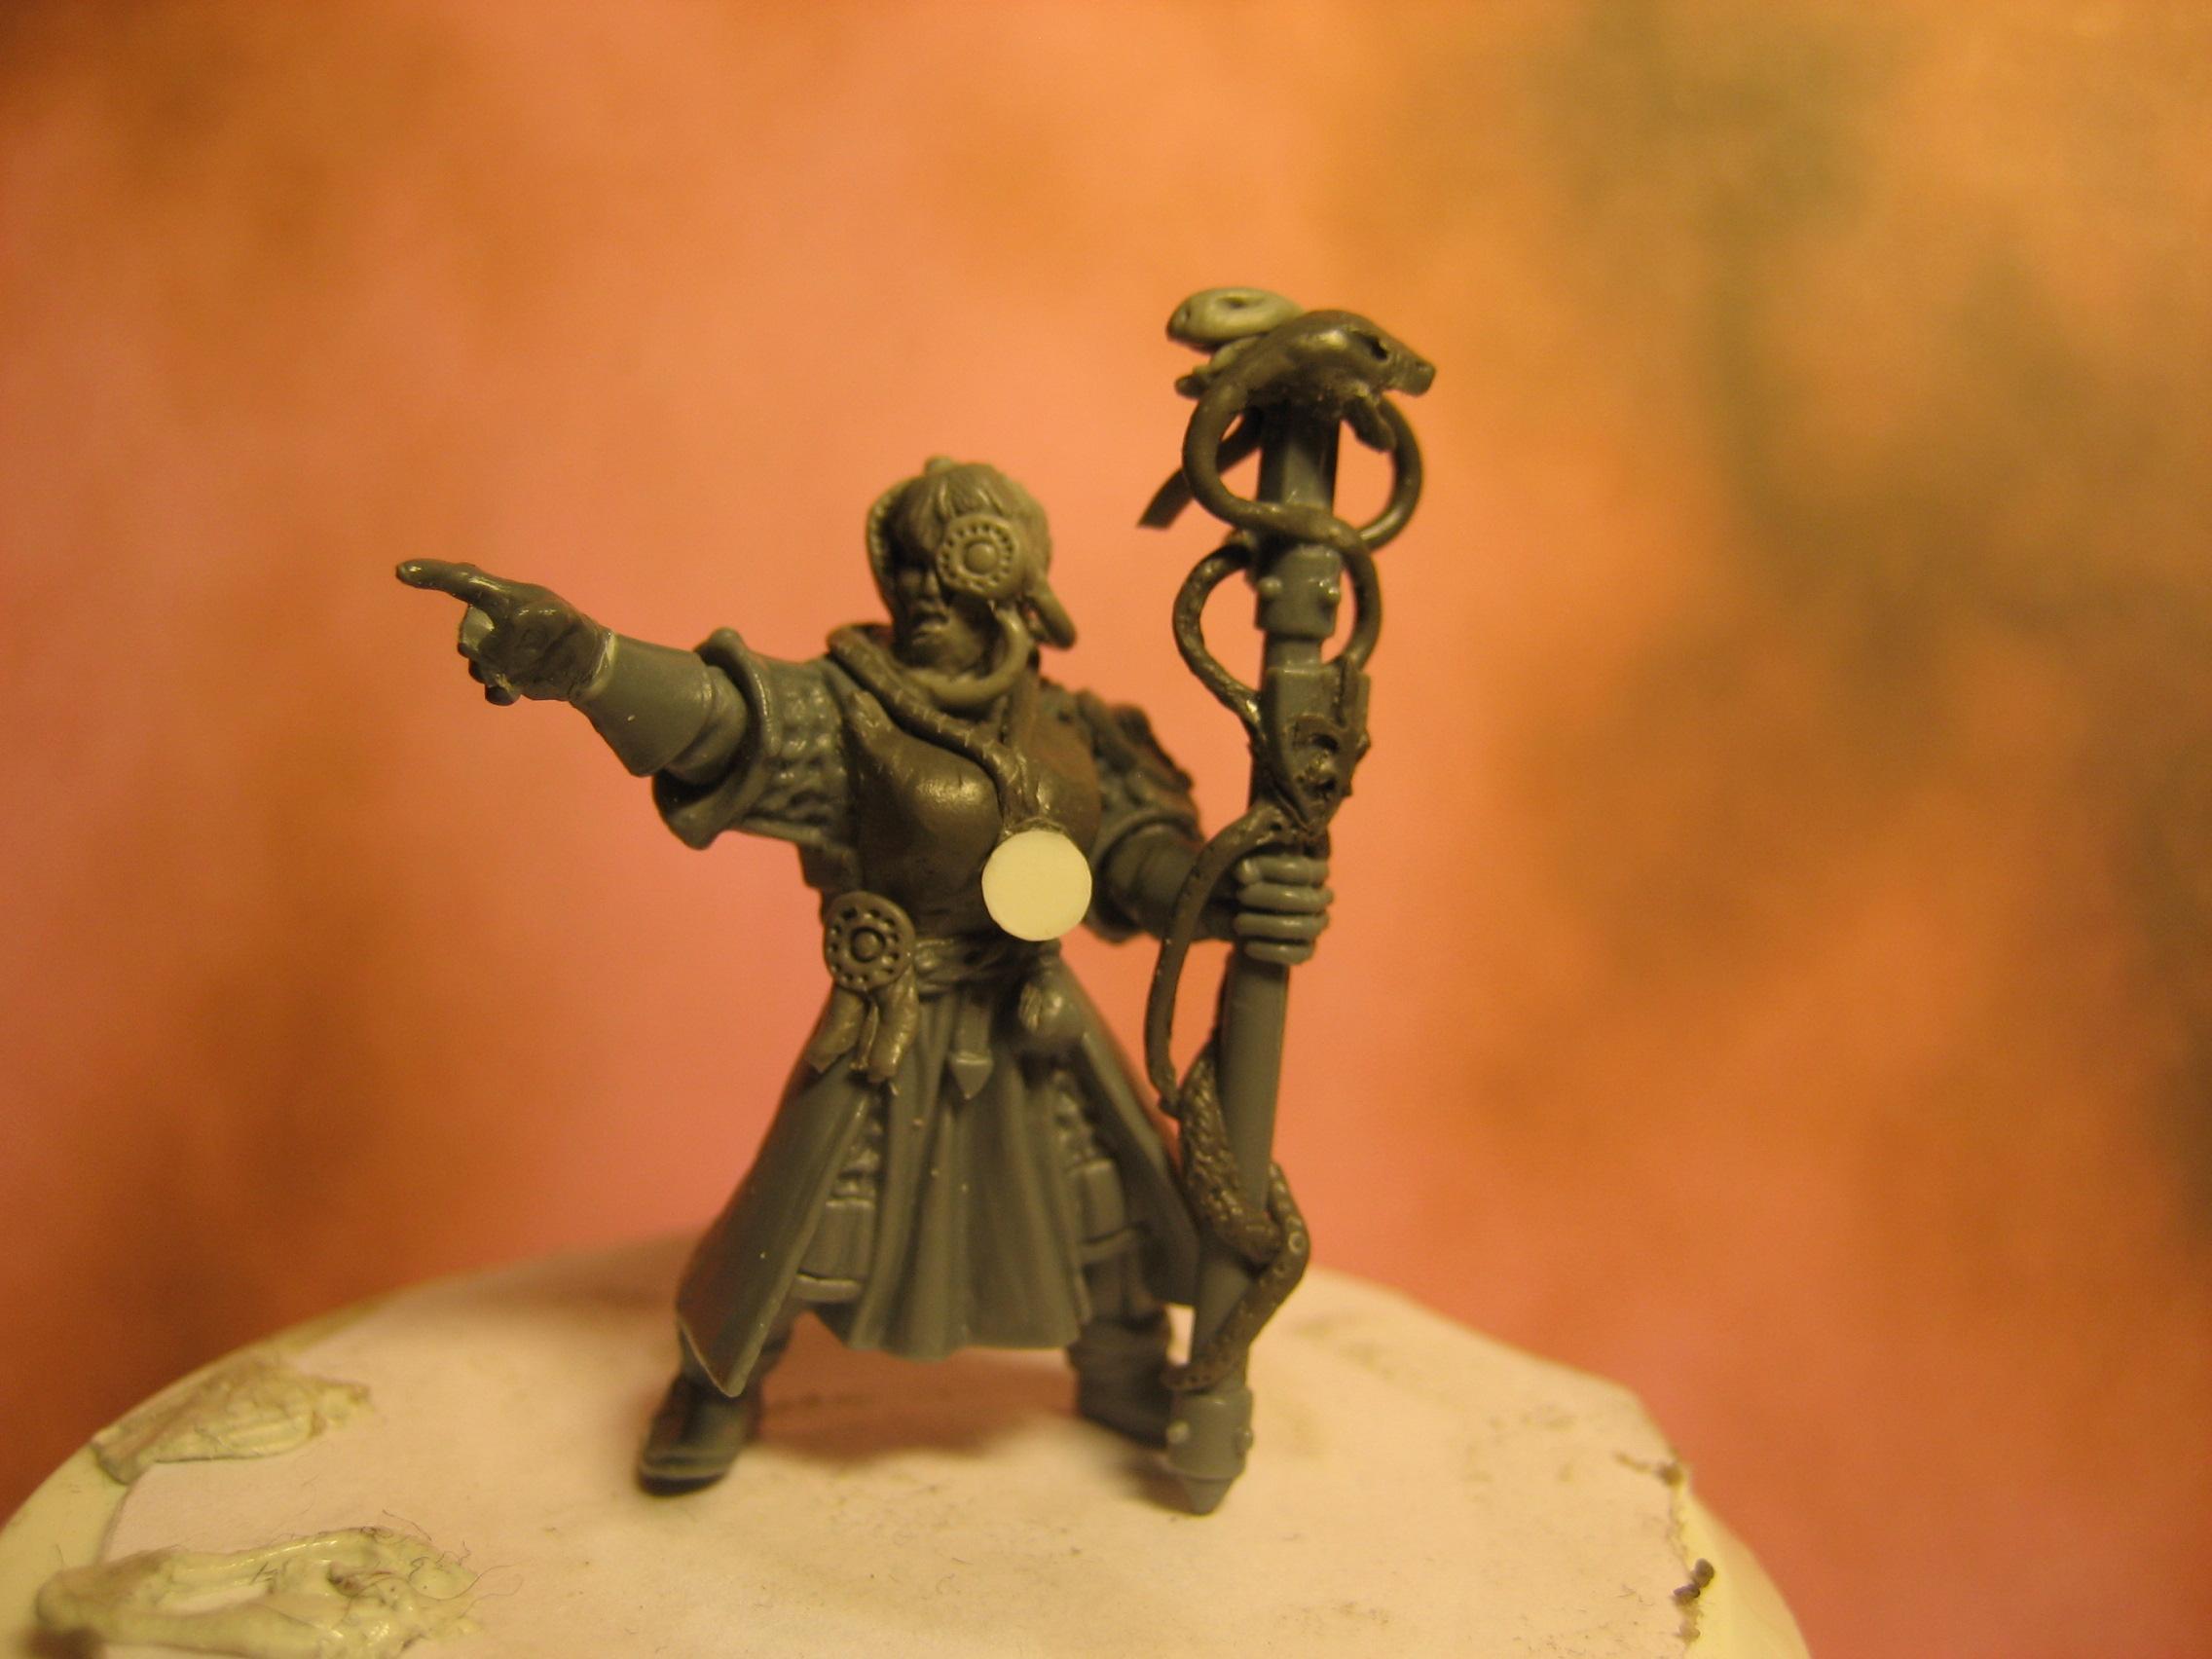 Henchman, Inquisition, Inquisitor